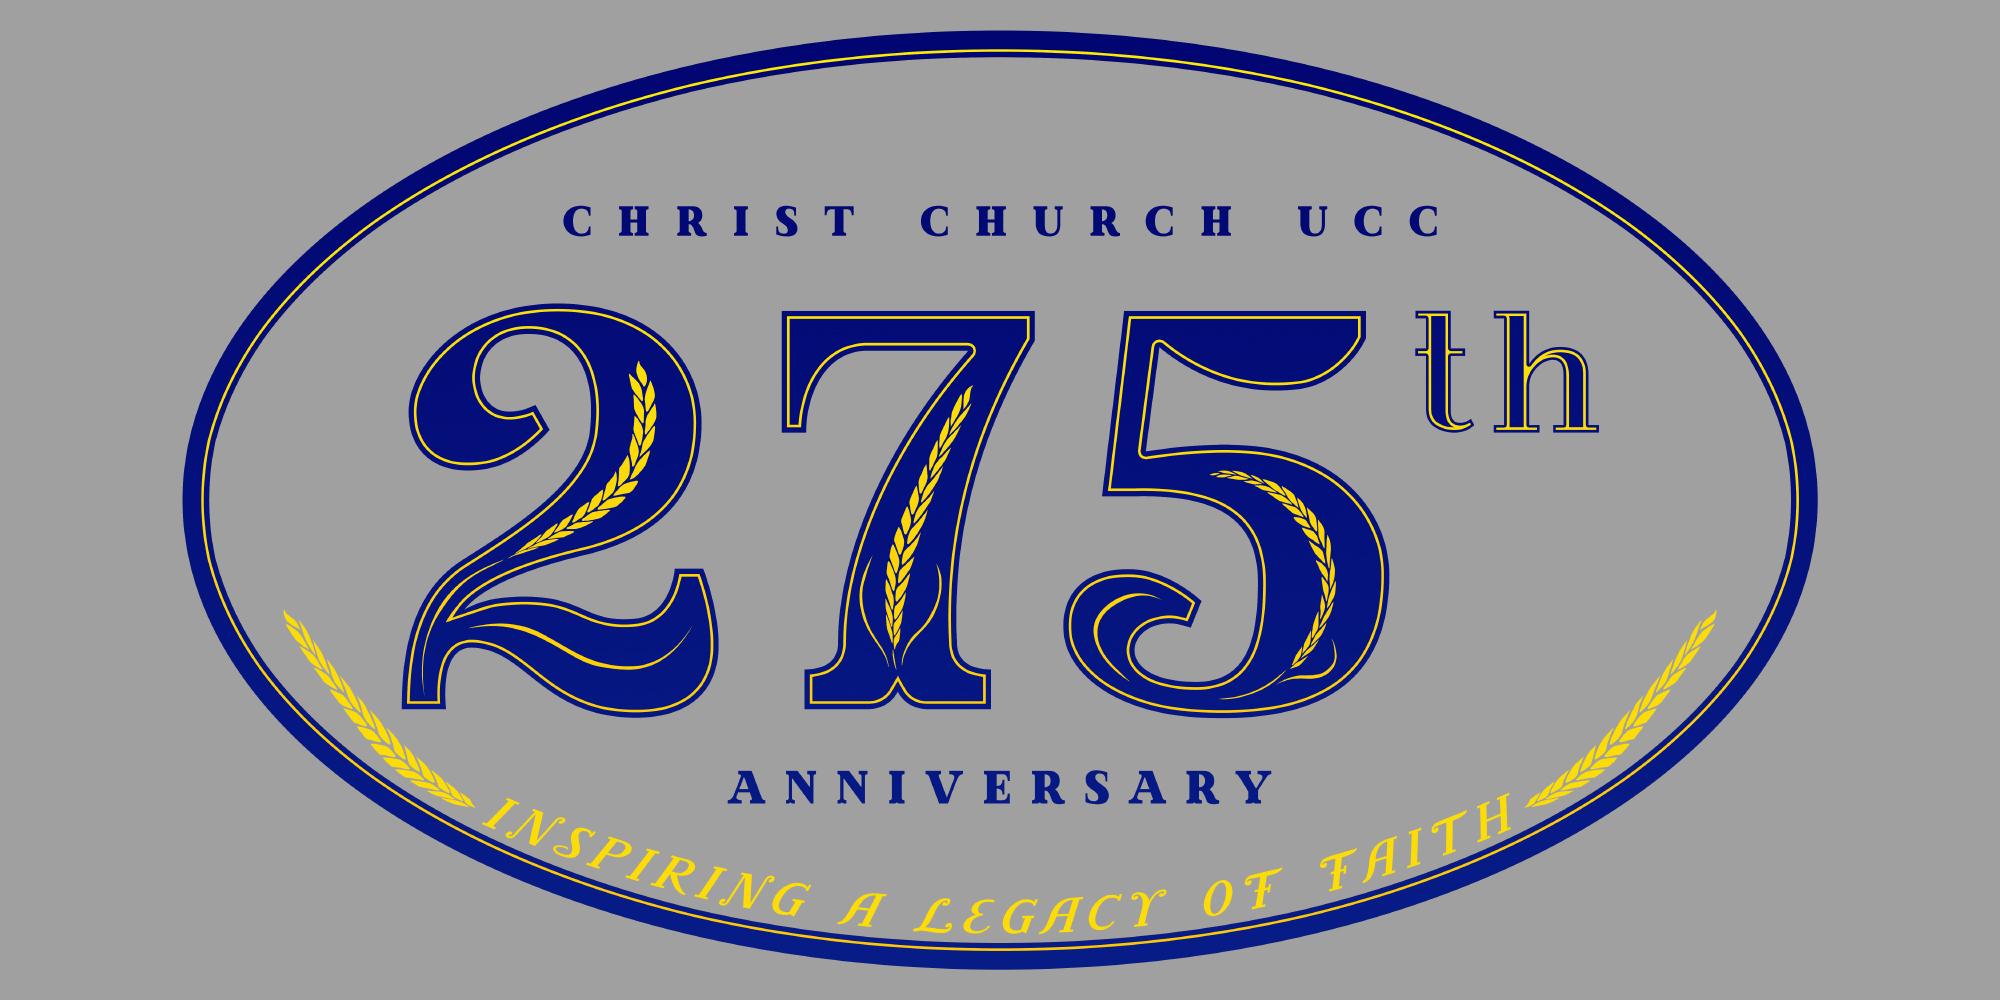 ucc logo 2.jpg